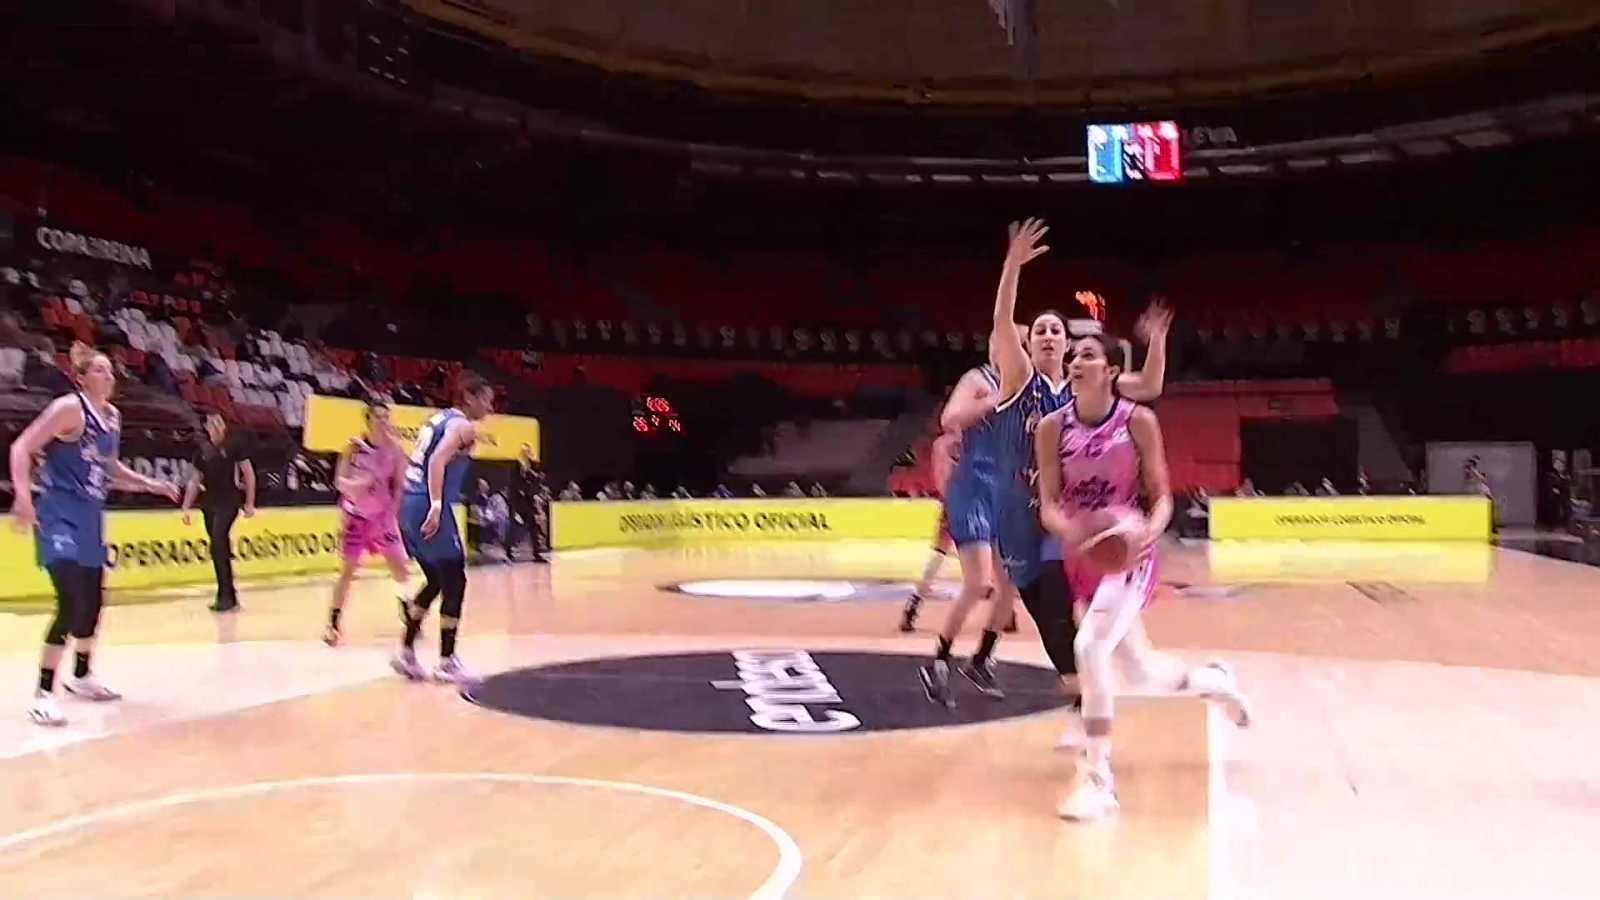 Baloncesto - Copa de la Reina 2021. 1/4 Final: Perfumerías Avenida - Durán Maquinaria - ver ahora